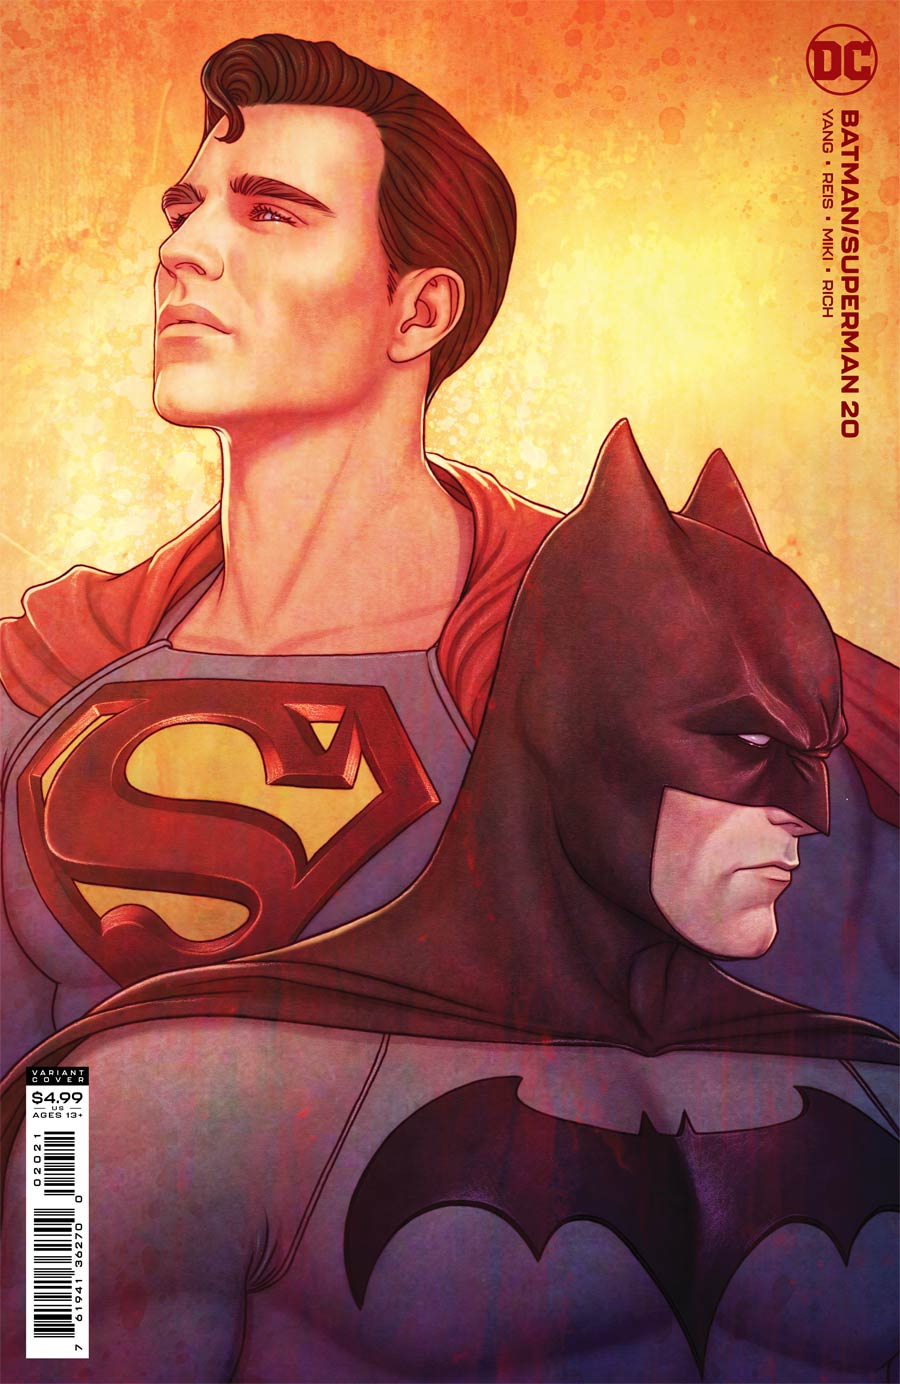 Batman Superman Vol 2 #20 Cover B Variant Jenny Frison Card Stock Cover